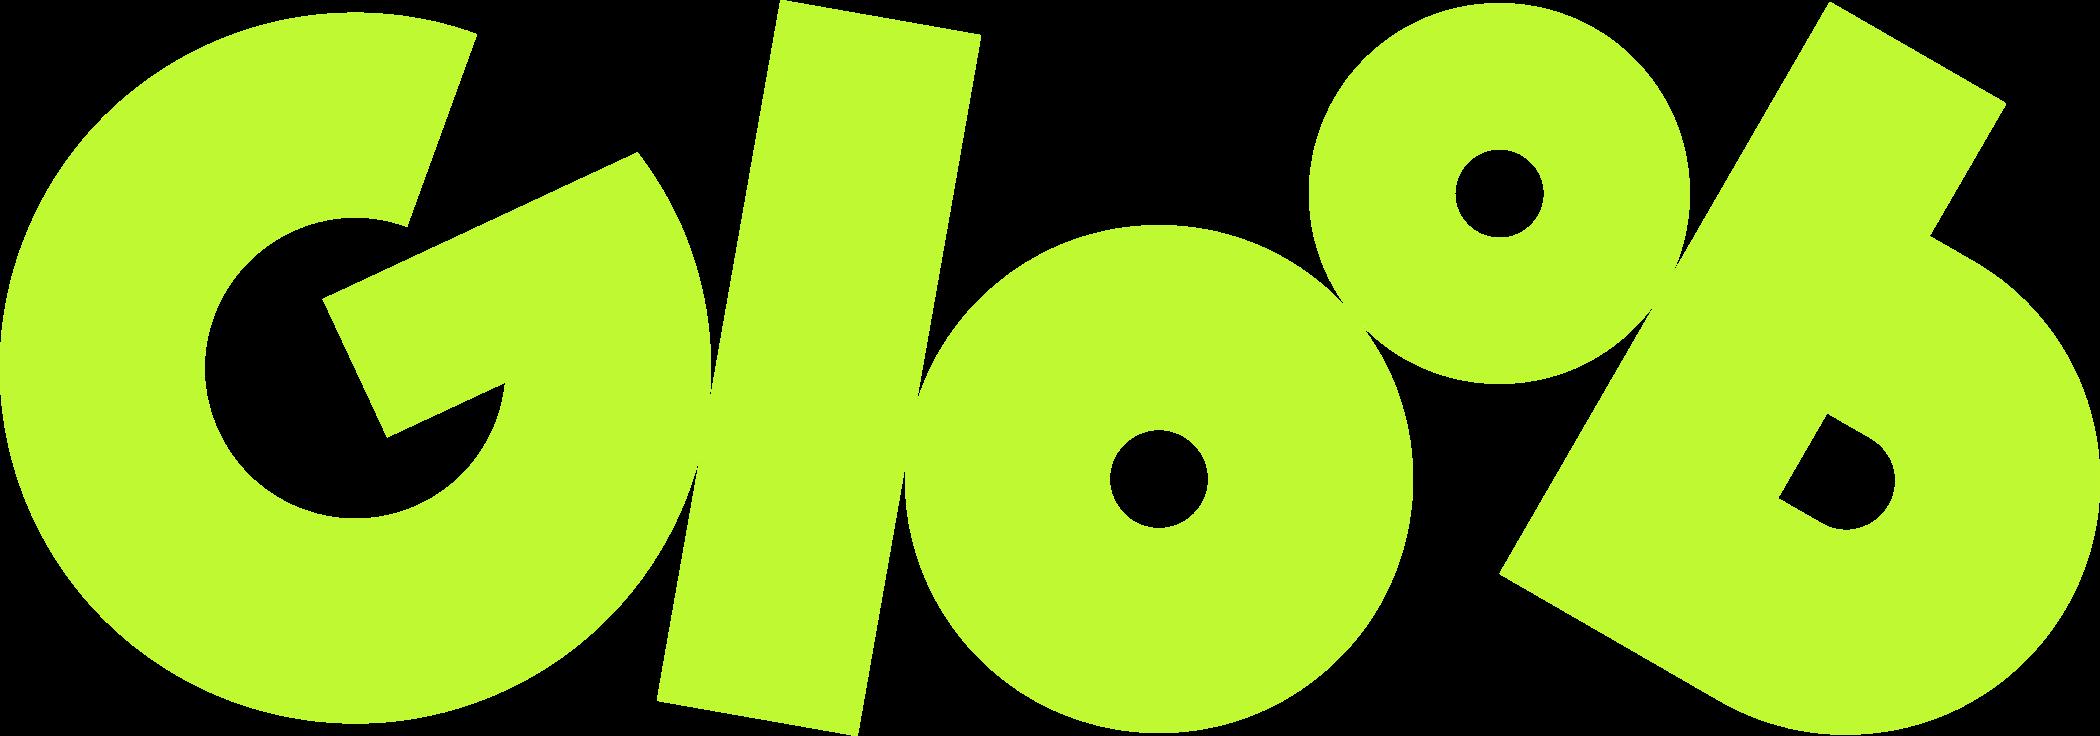 gloob logo 4 - Canal Gloob Logo